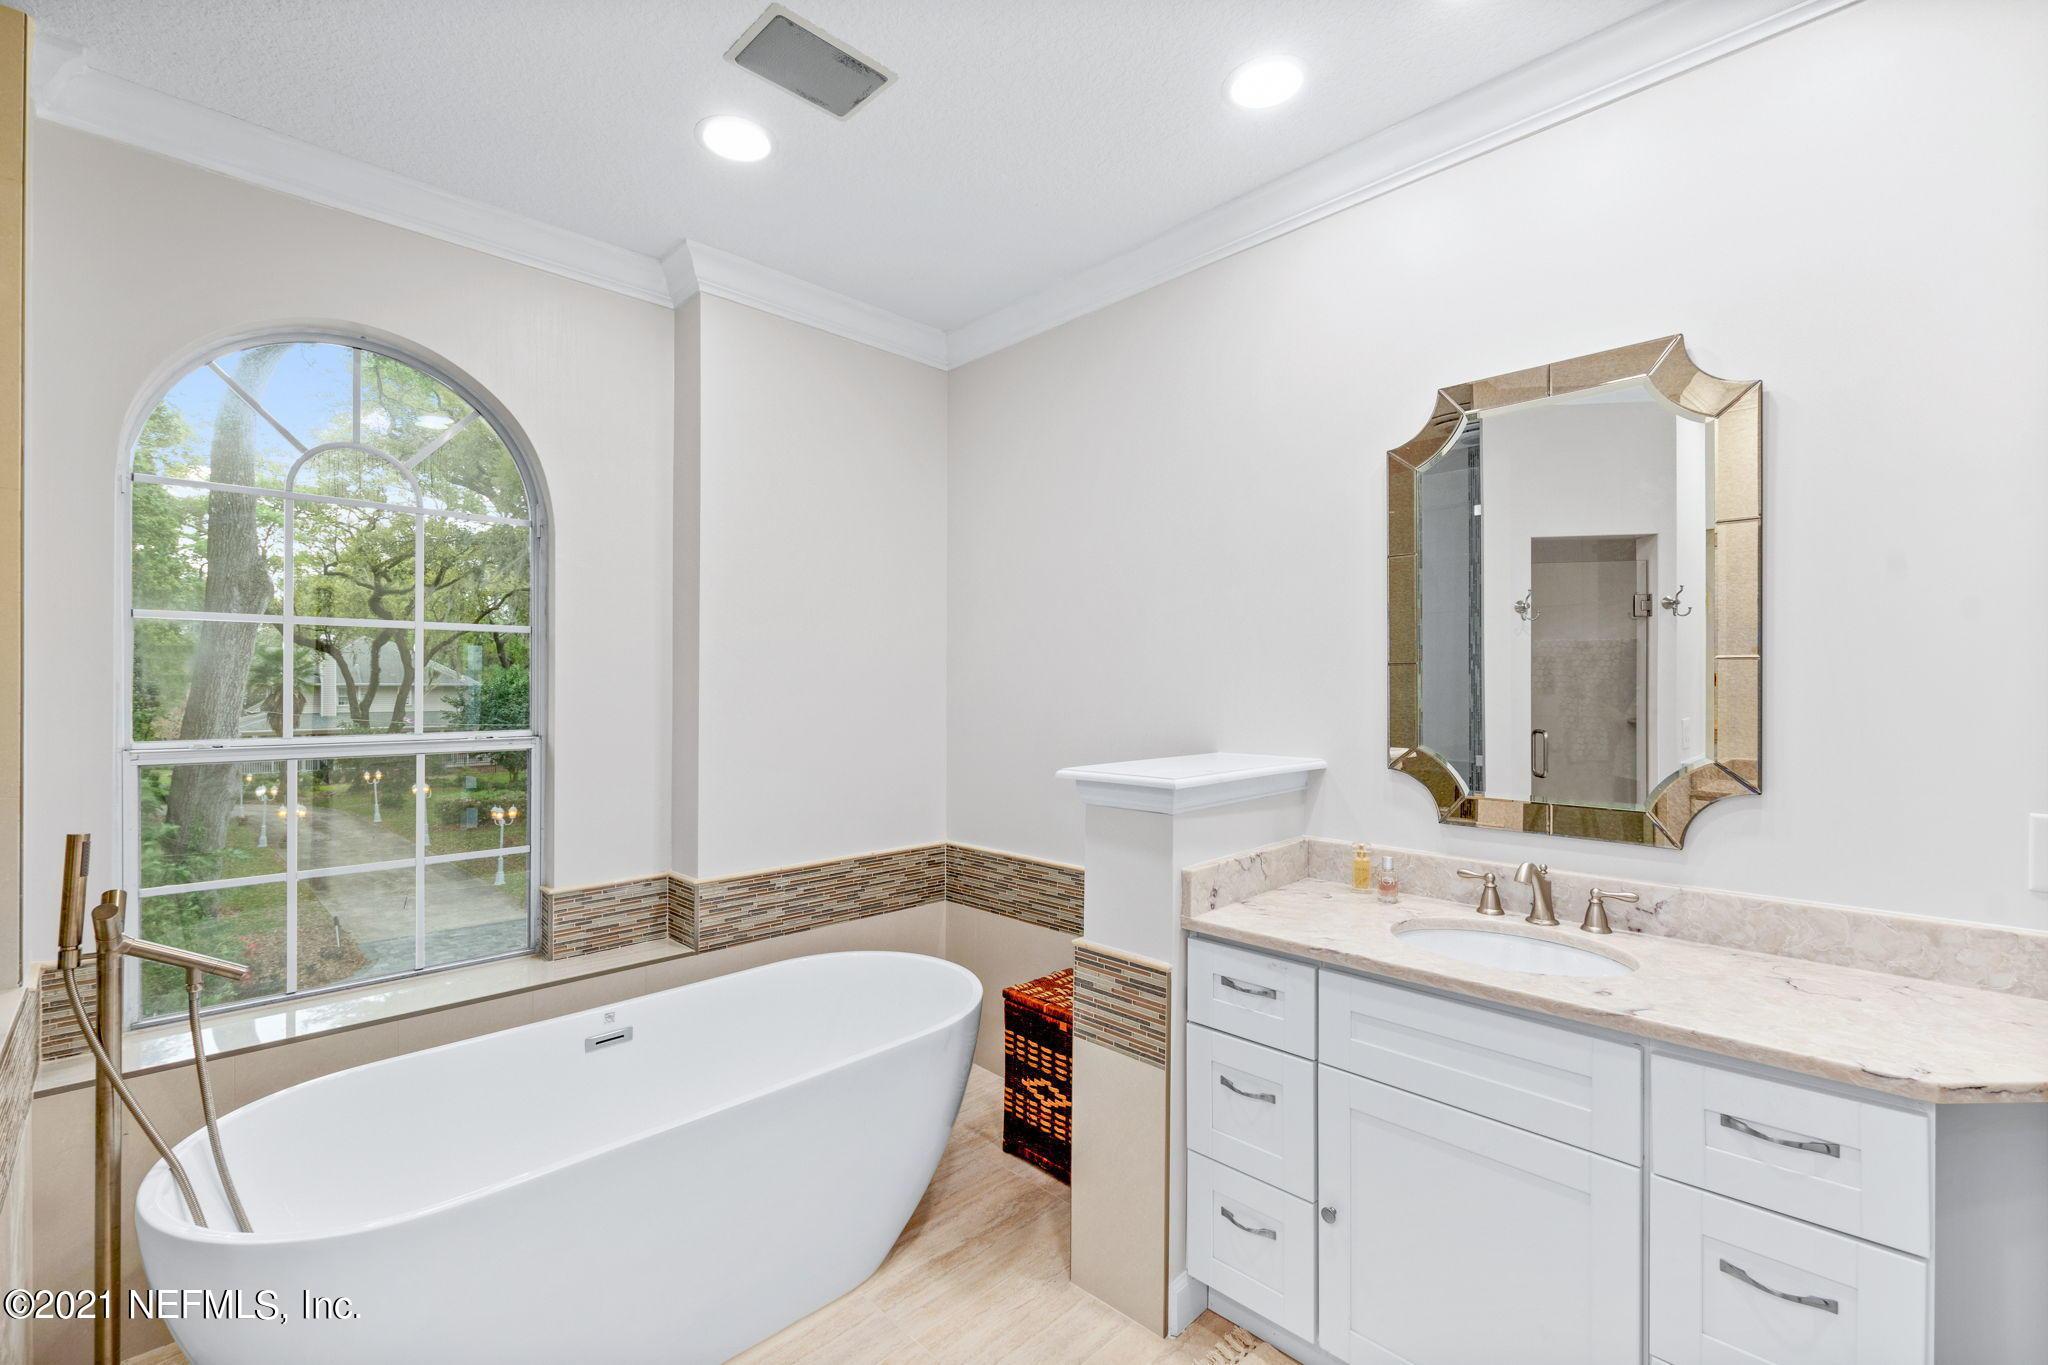 1202 SAN AMARO, JACKSONVILLE, FLORIDA 32207, 5 Bedrooms Bedrooms, ,3 BathroomsBathrooms,Residential,For sale,SAN AMARO,1101270